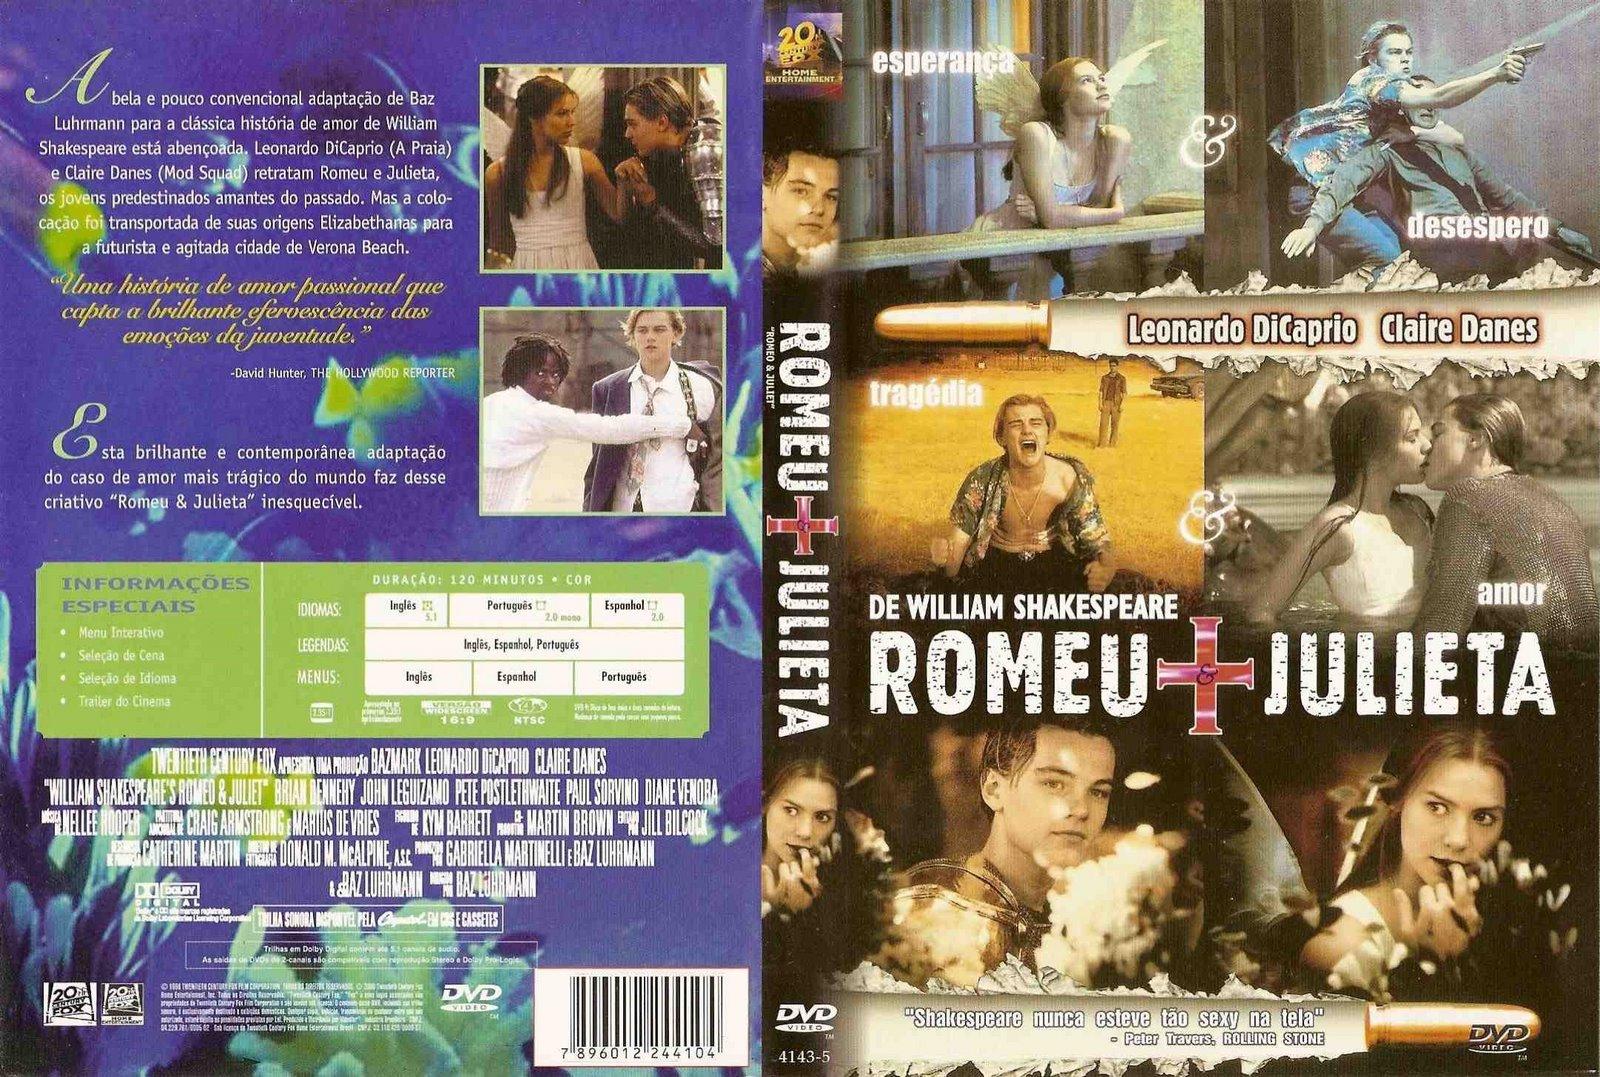 http://1.bp.blogspot.com/-RBhtoCwswl8/Td-2ZtA2GQI/AAAAAAAAAHI/F-FpINwl_gs/s1600/Romeu+e+Julieta.jpg